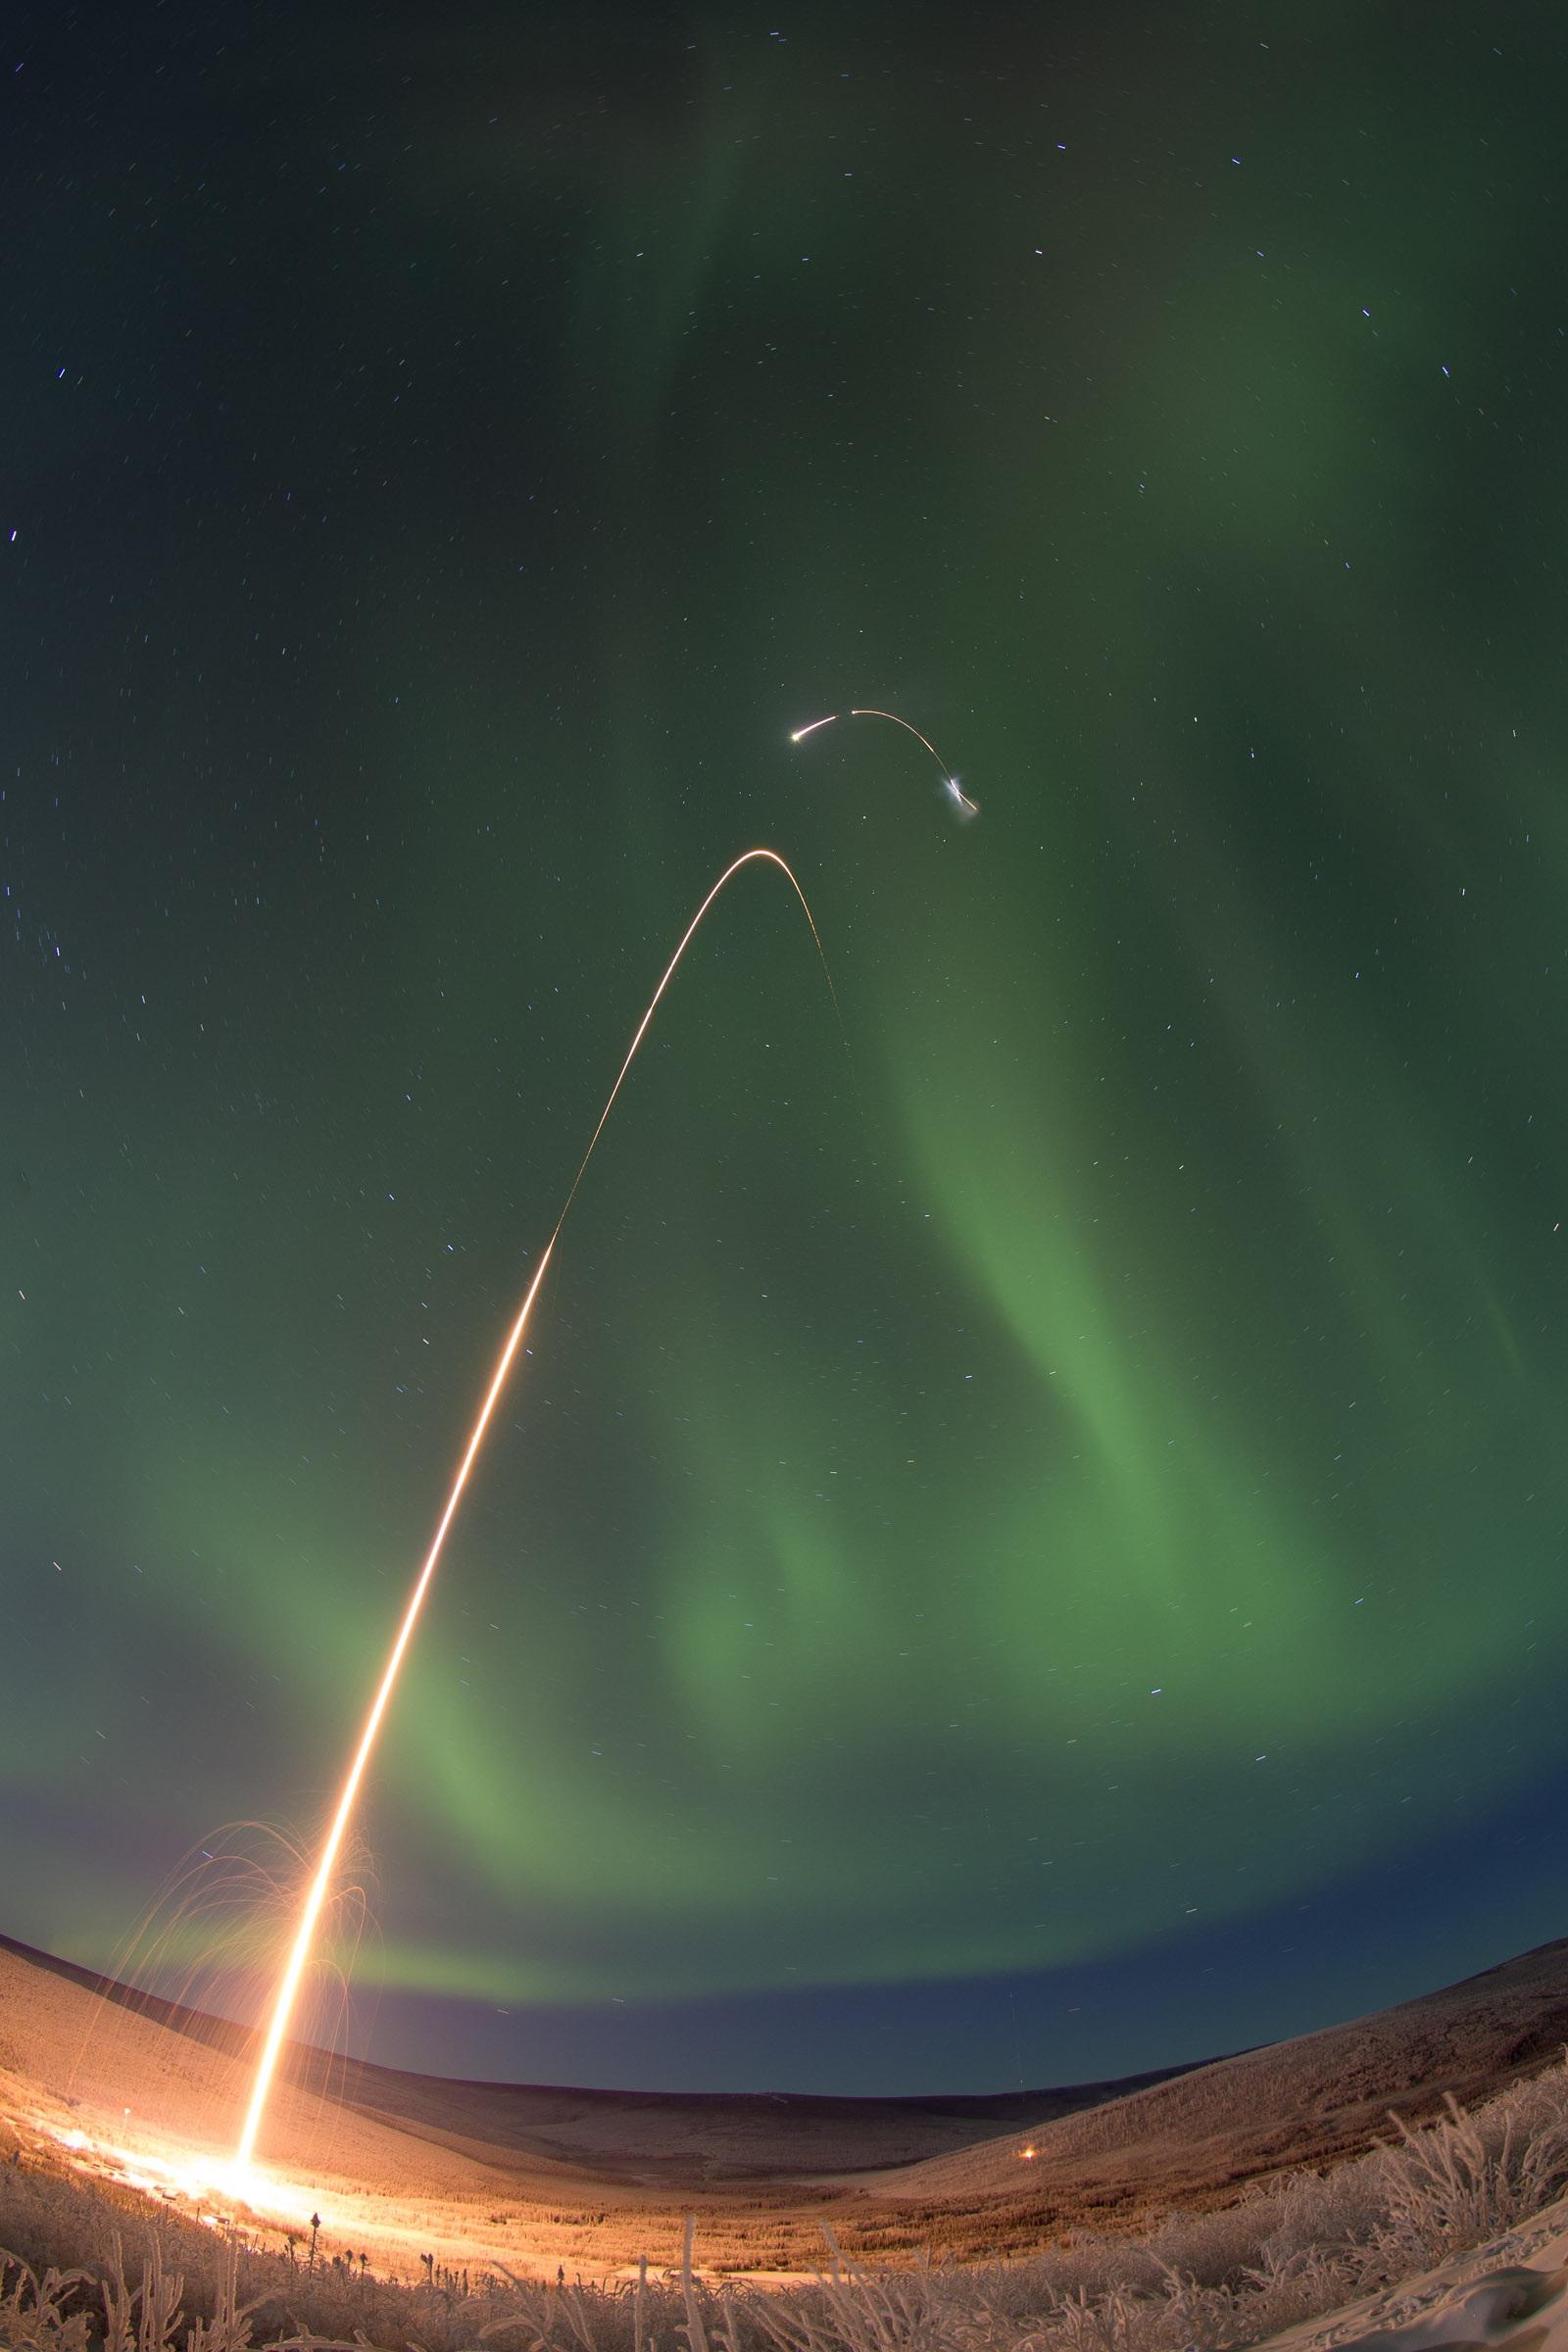 ASSP Sounding Rocket Launches Successfully from Alaska   NASA